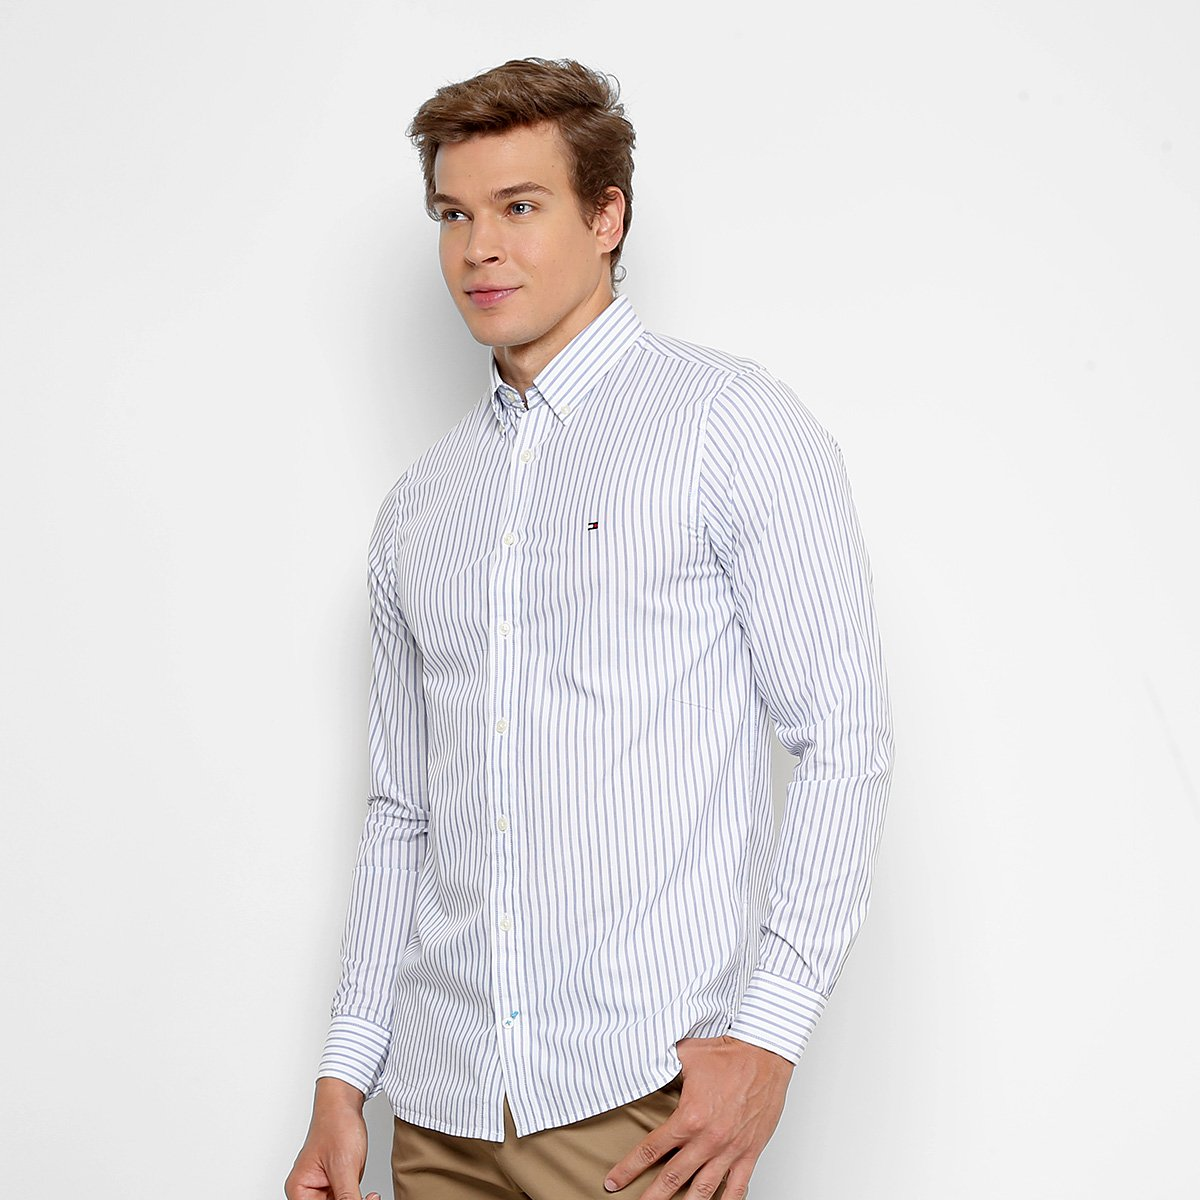 f5b0283407 Camisa Tommy Hilfiger Listras Slim Fit Masculina - Compre Agora ...